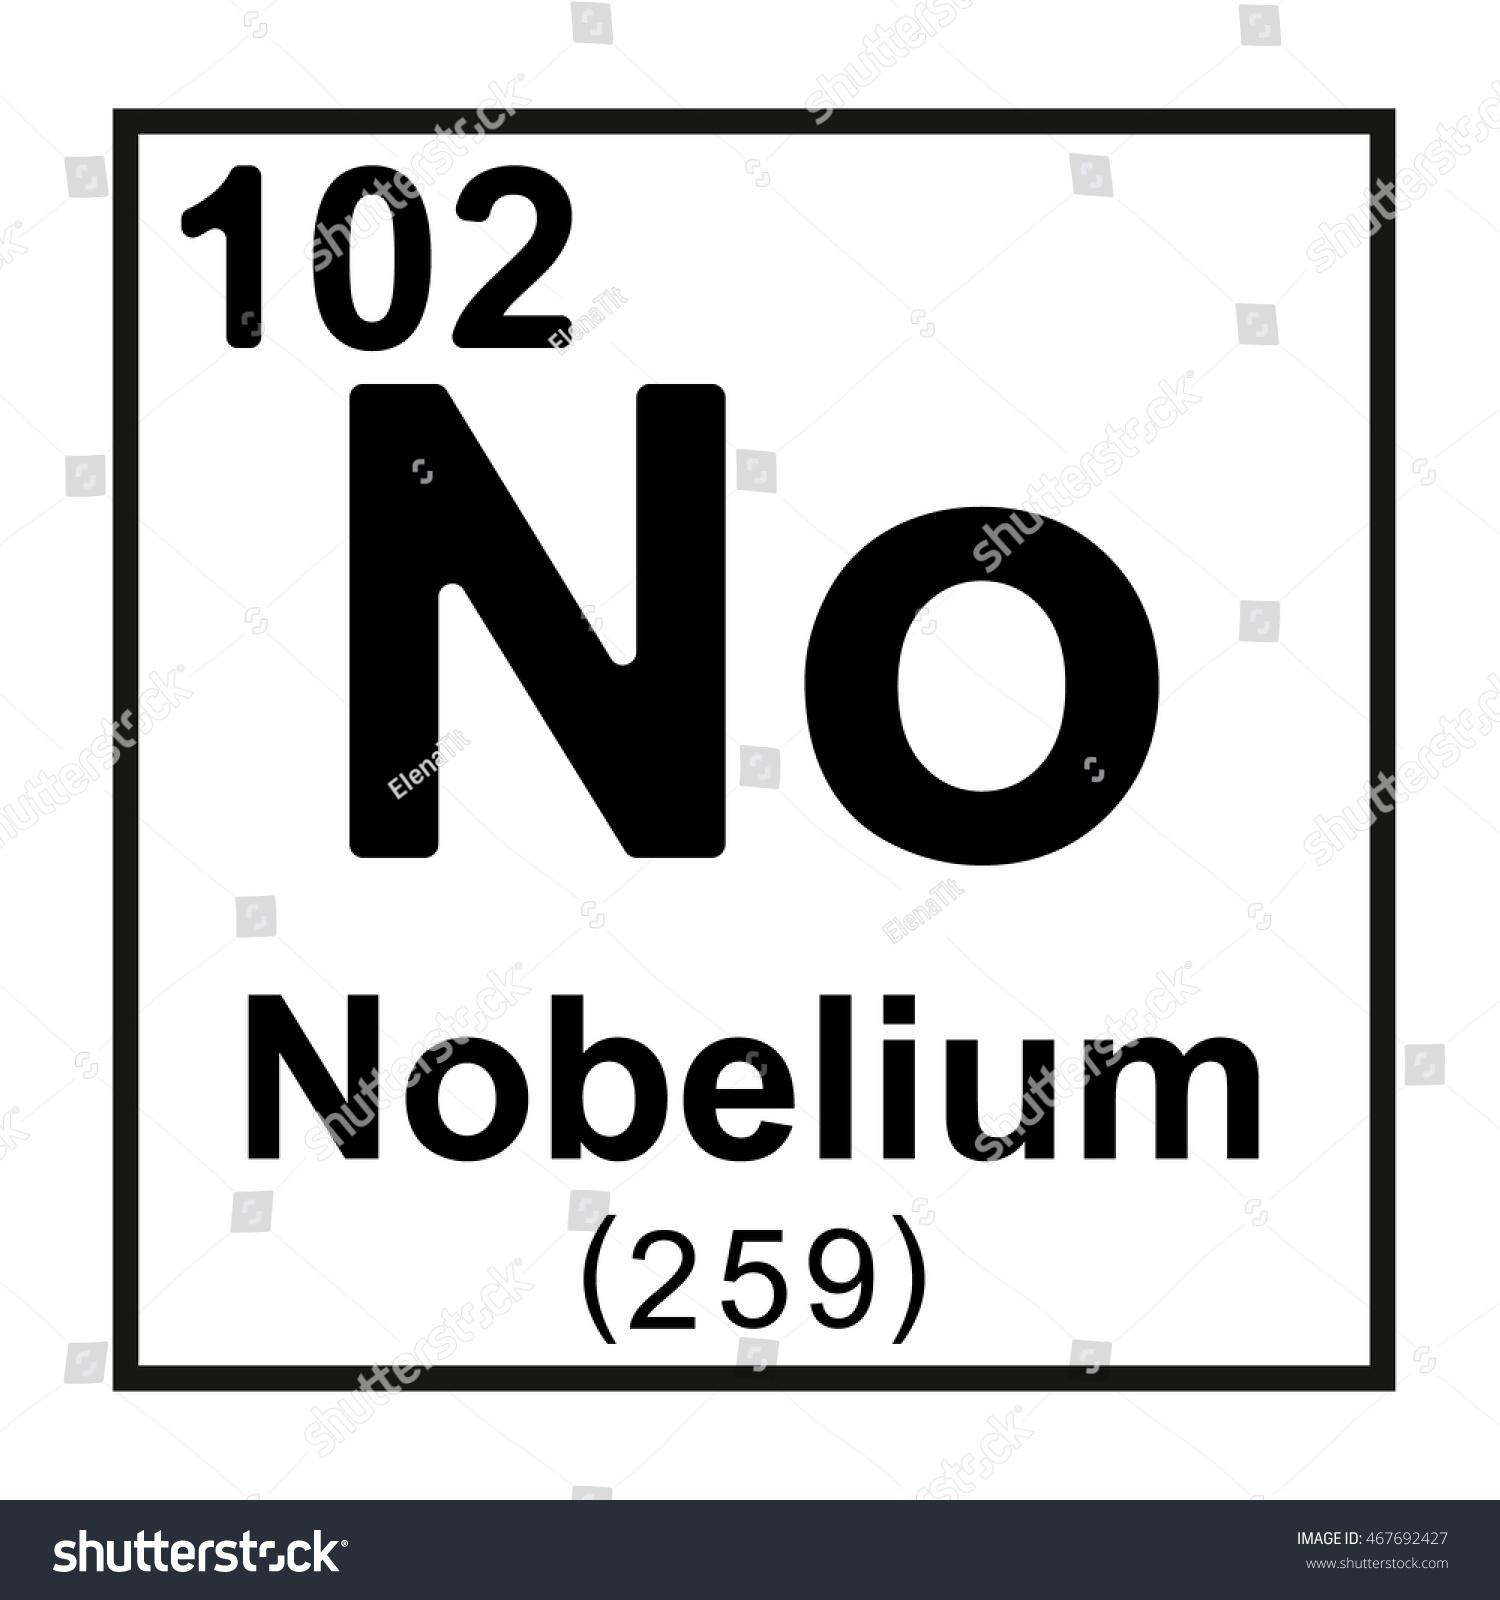 Periodic table element nobelium stock vector 467692427 shutterstock periodic table element nobelium buycottarizona